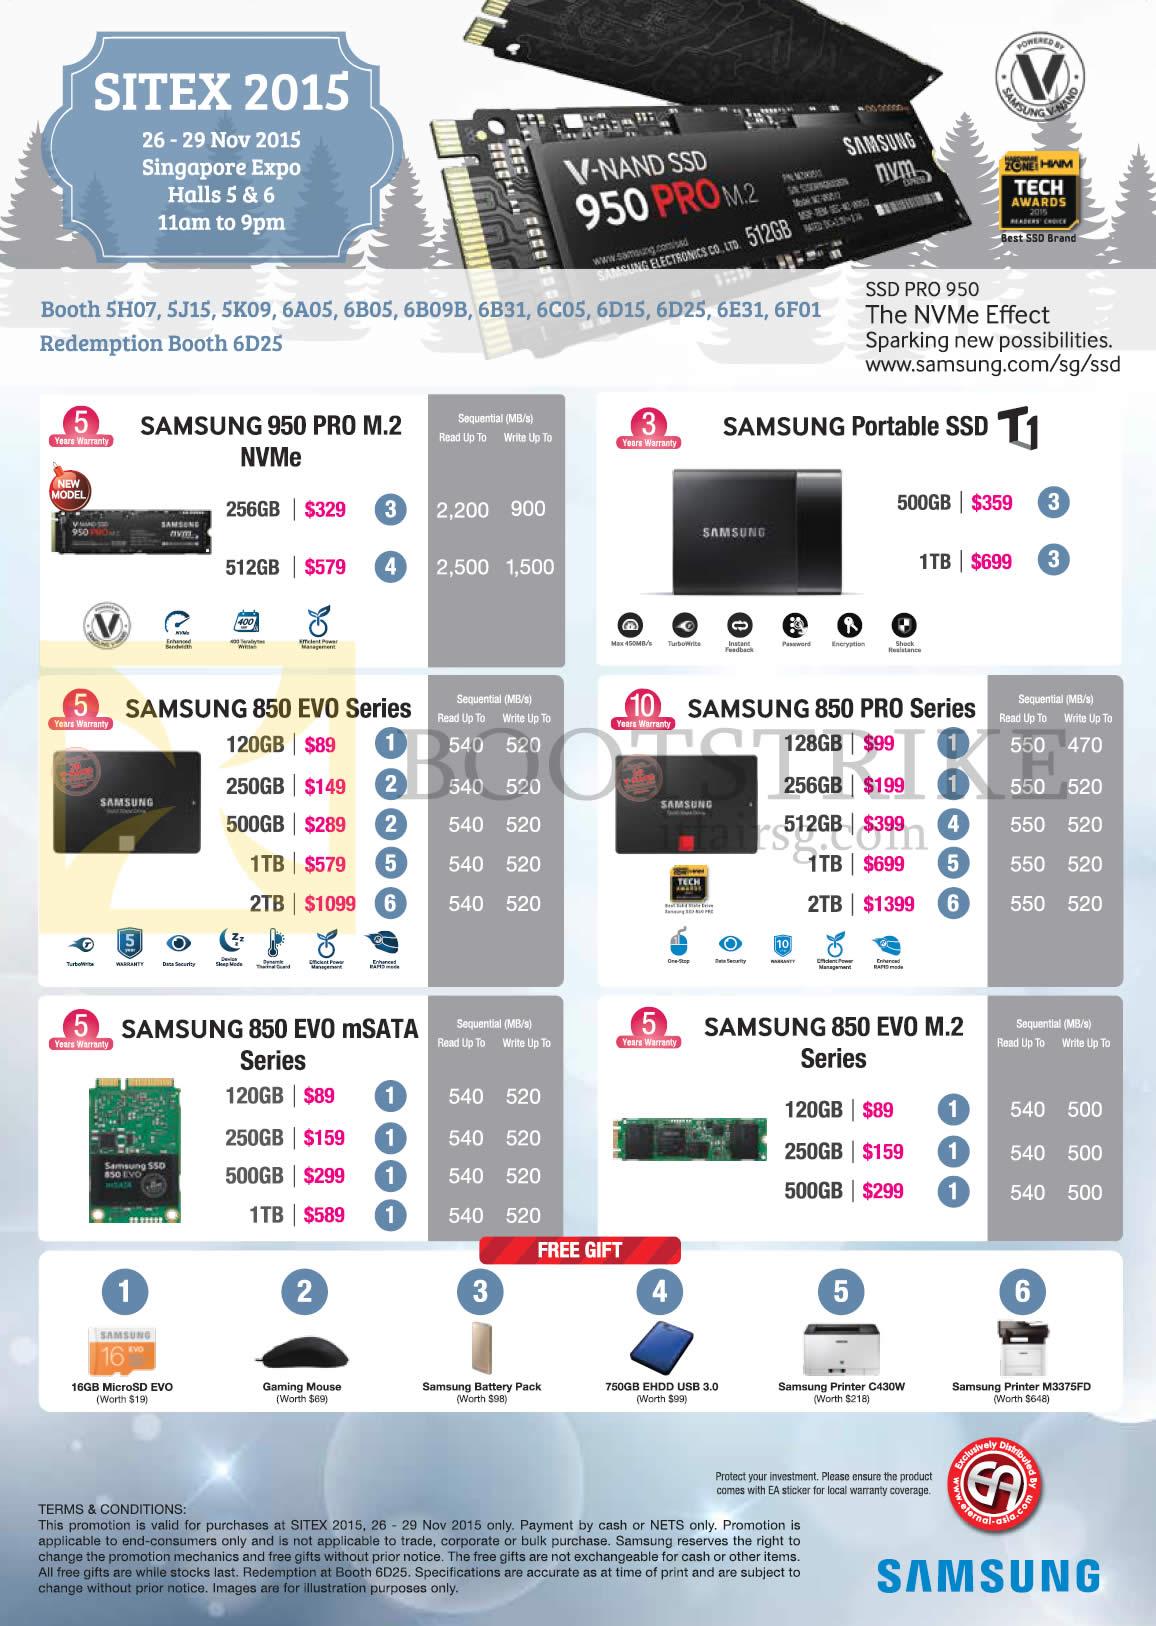 SITEX 2015 price list image brochure of Samsung SSDs 950 Pro M.2 NVMe, T1, 850 Evo Series, 850 Pro Series, 850 EVO MSata, 850 Evo M.2